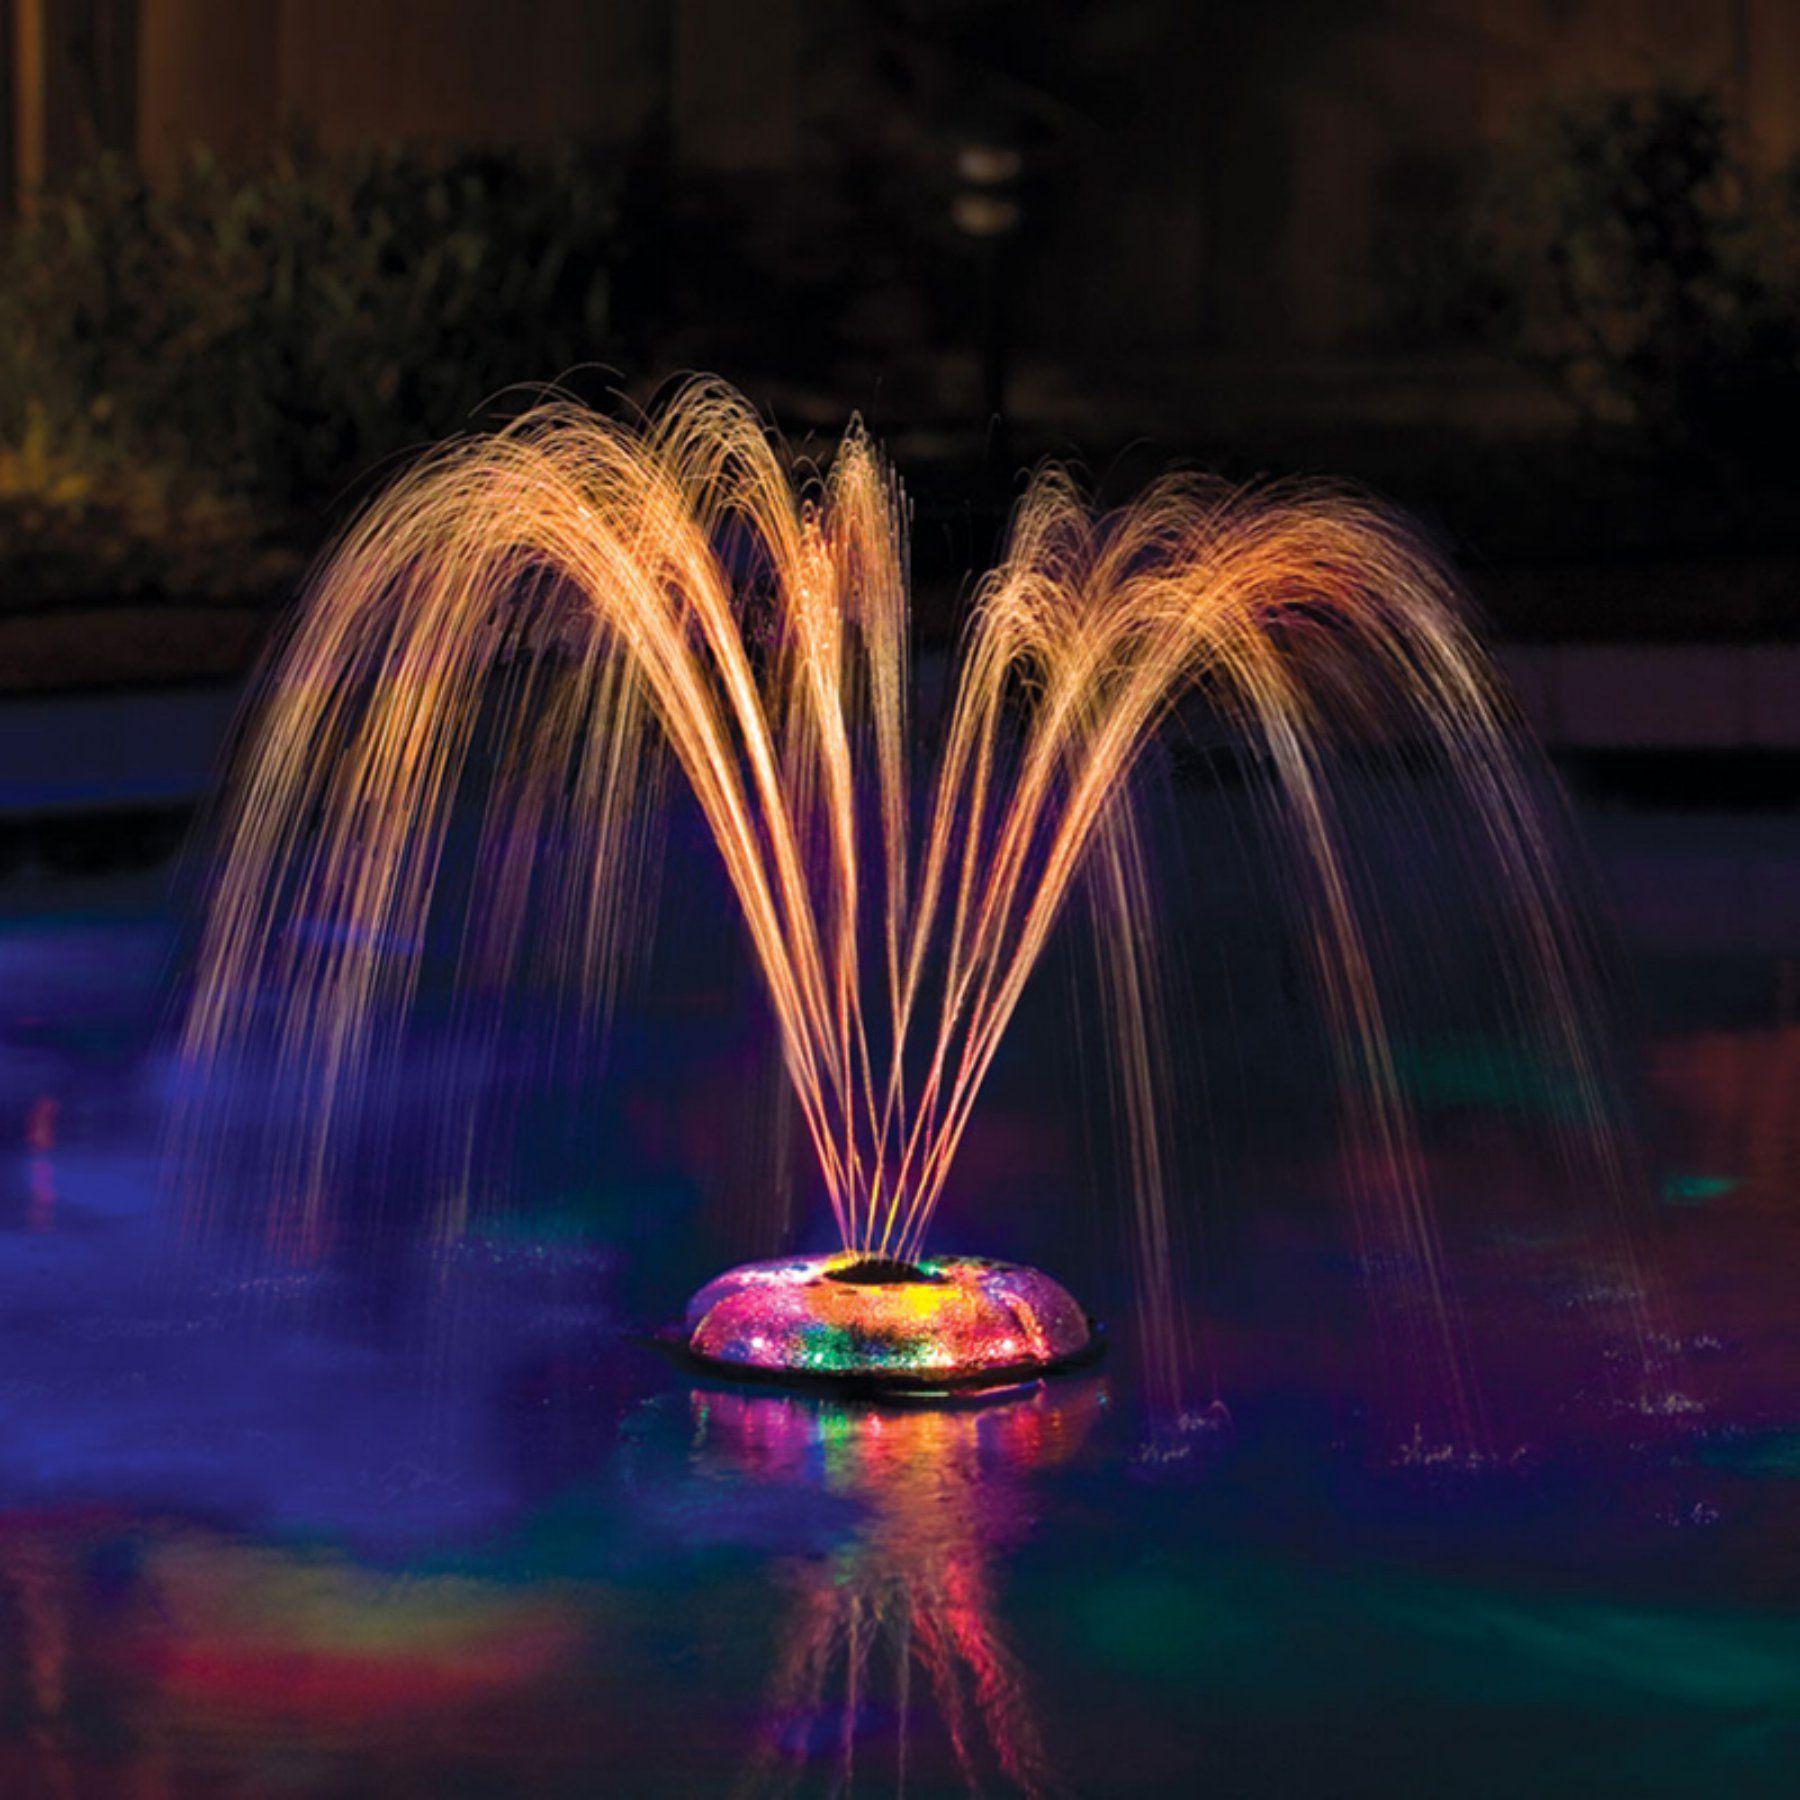 Honey Waterproof Fantastic Rgb Childrens Pool Light Floating Underwater Led Disco Light Spa Bathtub Light Swimming Pool Float Lamp Lights & Lighting Led Underwater Lights